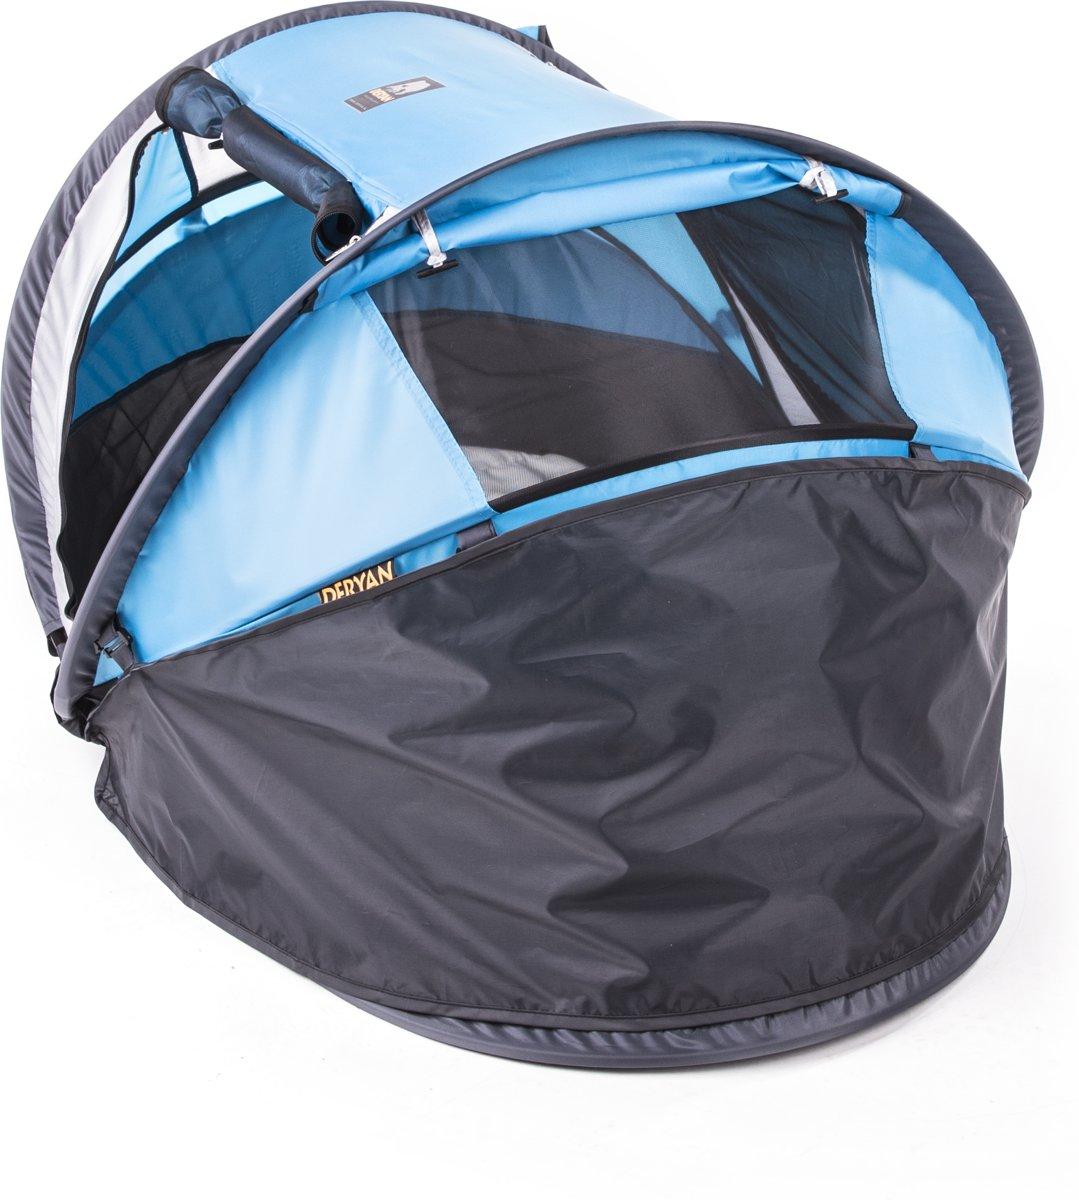 Deryan Peuter Campingbedje.Overige Deryan Travel Cot Peuter Luxe Blauw Tropicalweather